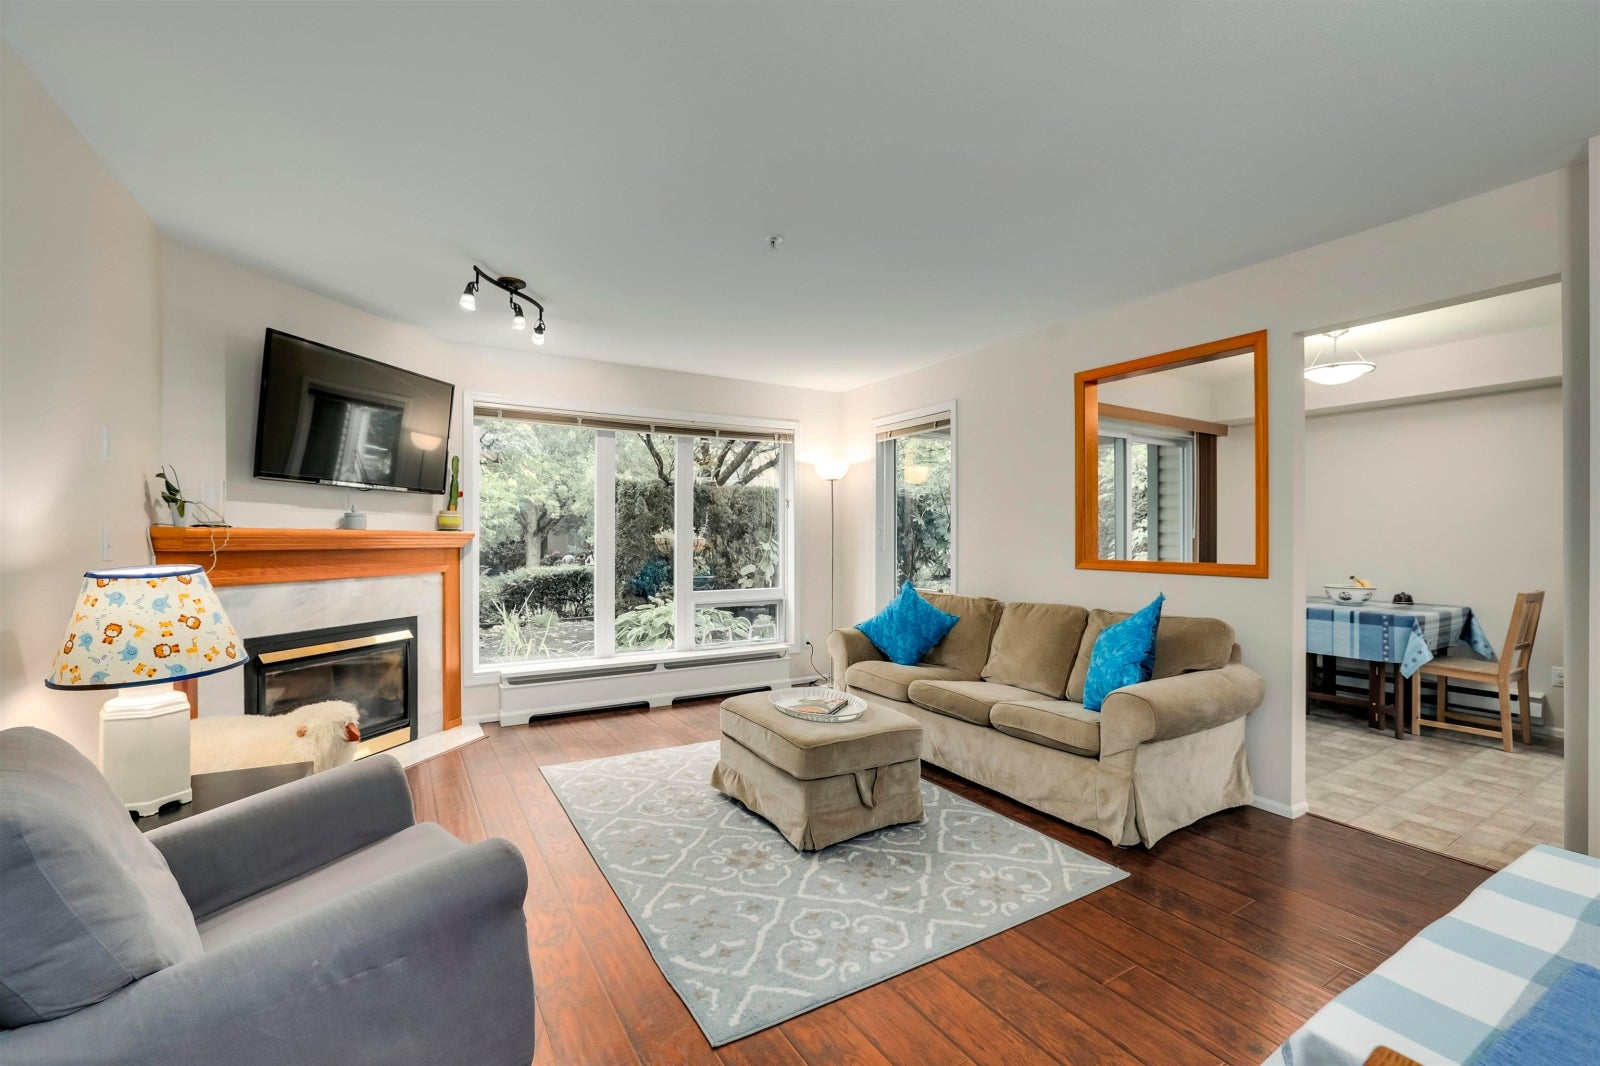 103 1132 DUFFERIN STREET - Eagle Ridge CQ Apartment/Condo for sale, 2 Bedrooms (R2618654) #2